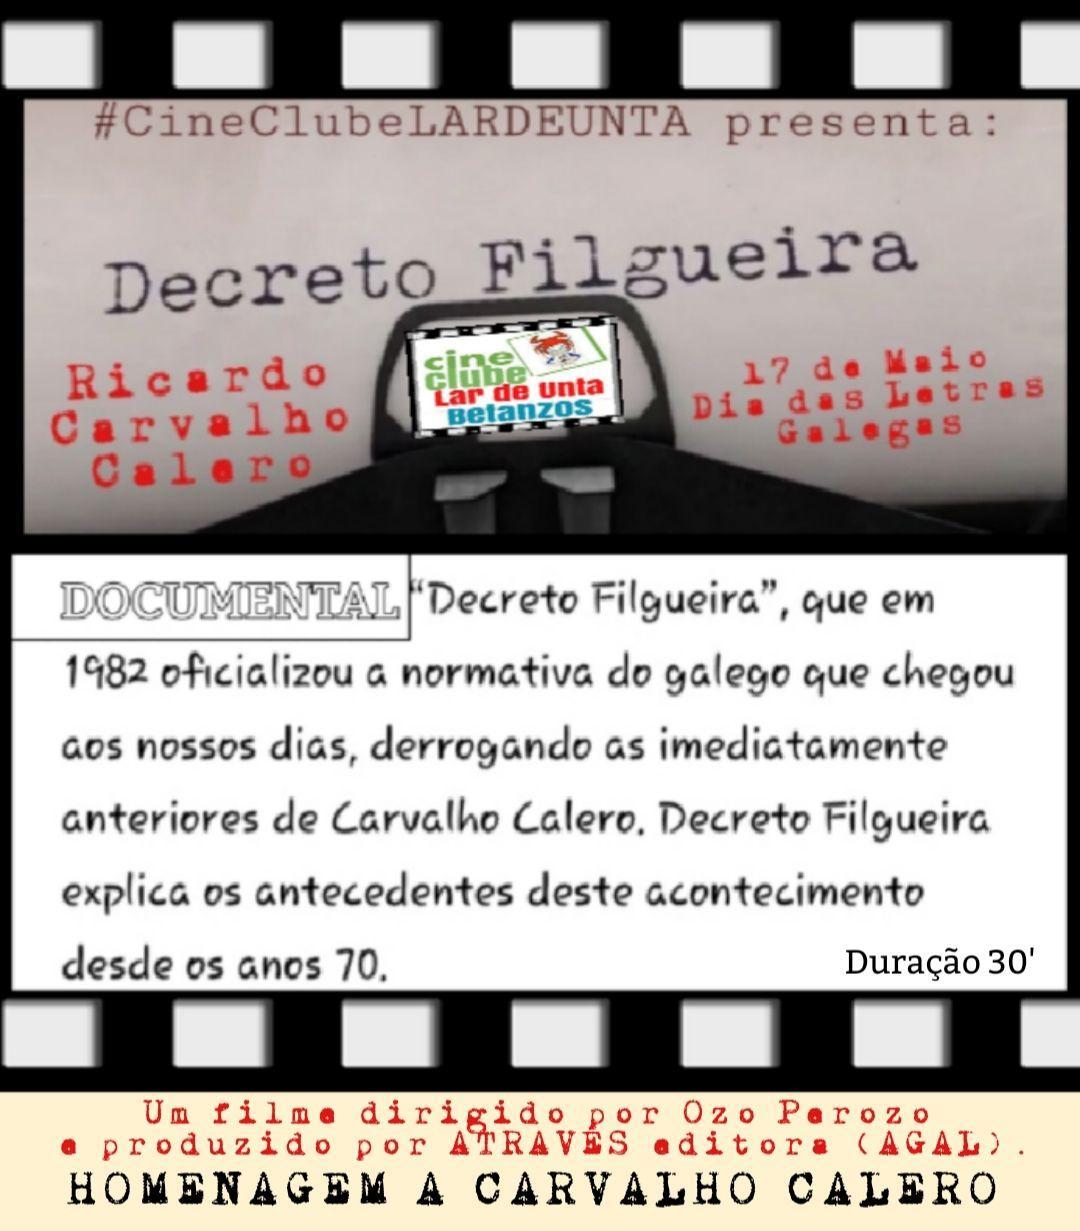 Cine Clube Lar de Unta: Decreto Filgueira